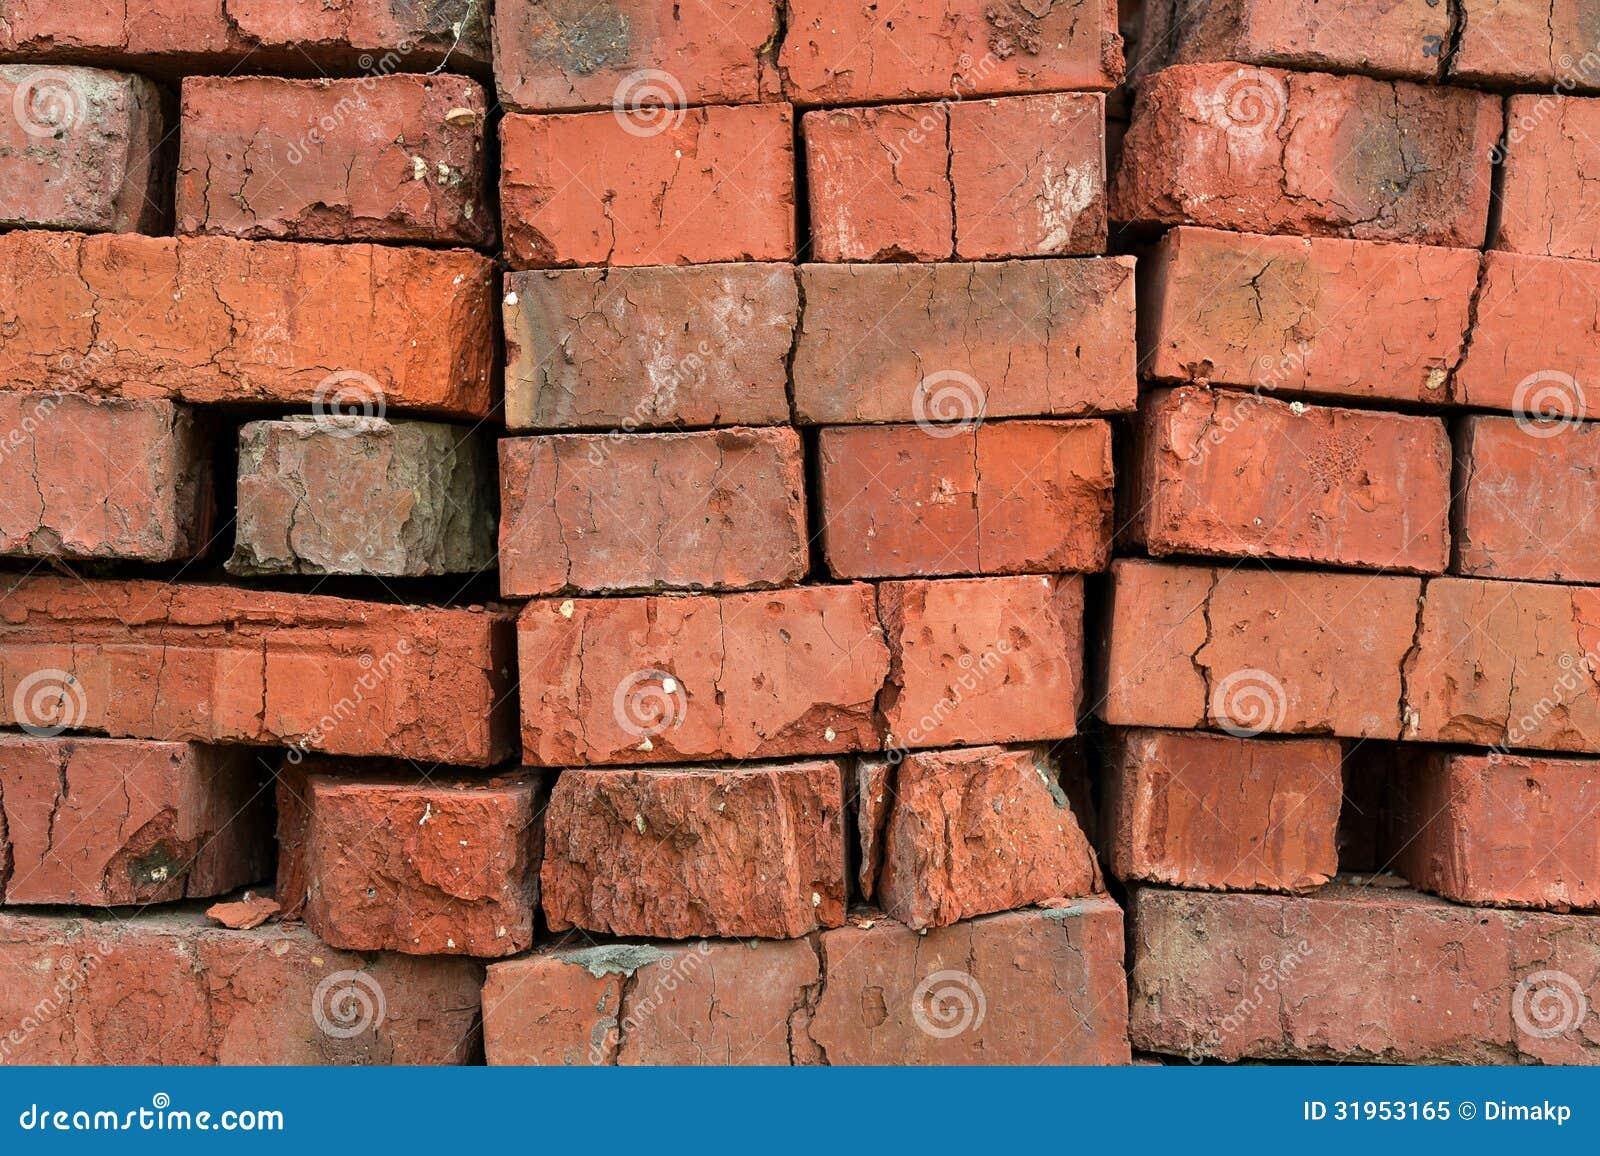 Red Clay Bricks : Red clay bricks royalty free stock photo image